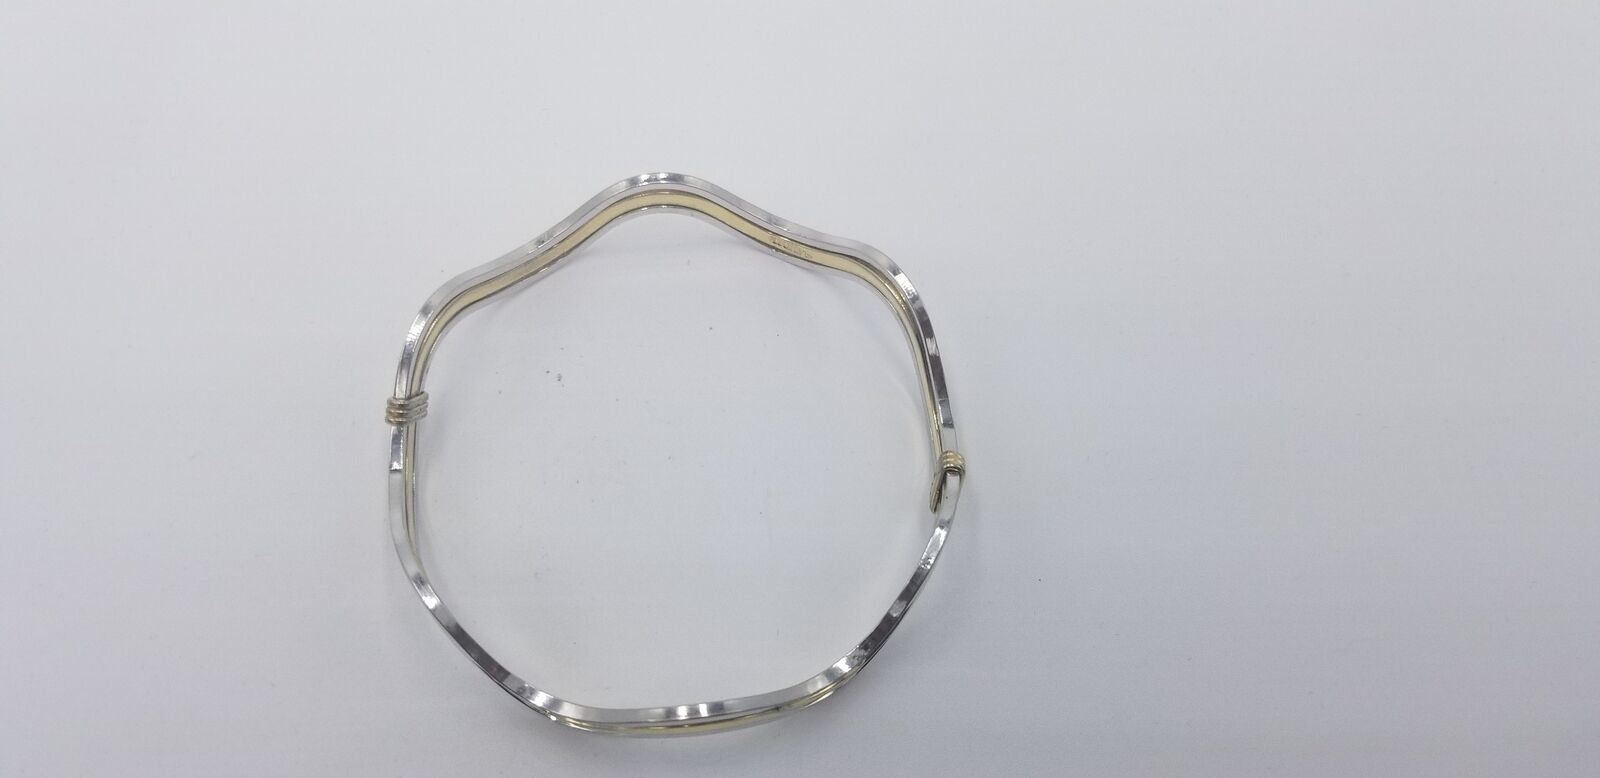 Vintage Signed Avon Silver And Gold Tone Wavy Style No Clasp Bracelet EUC image 5